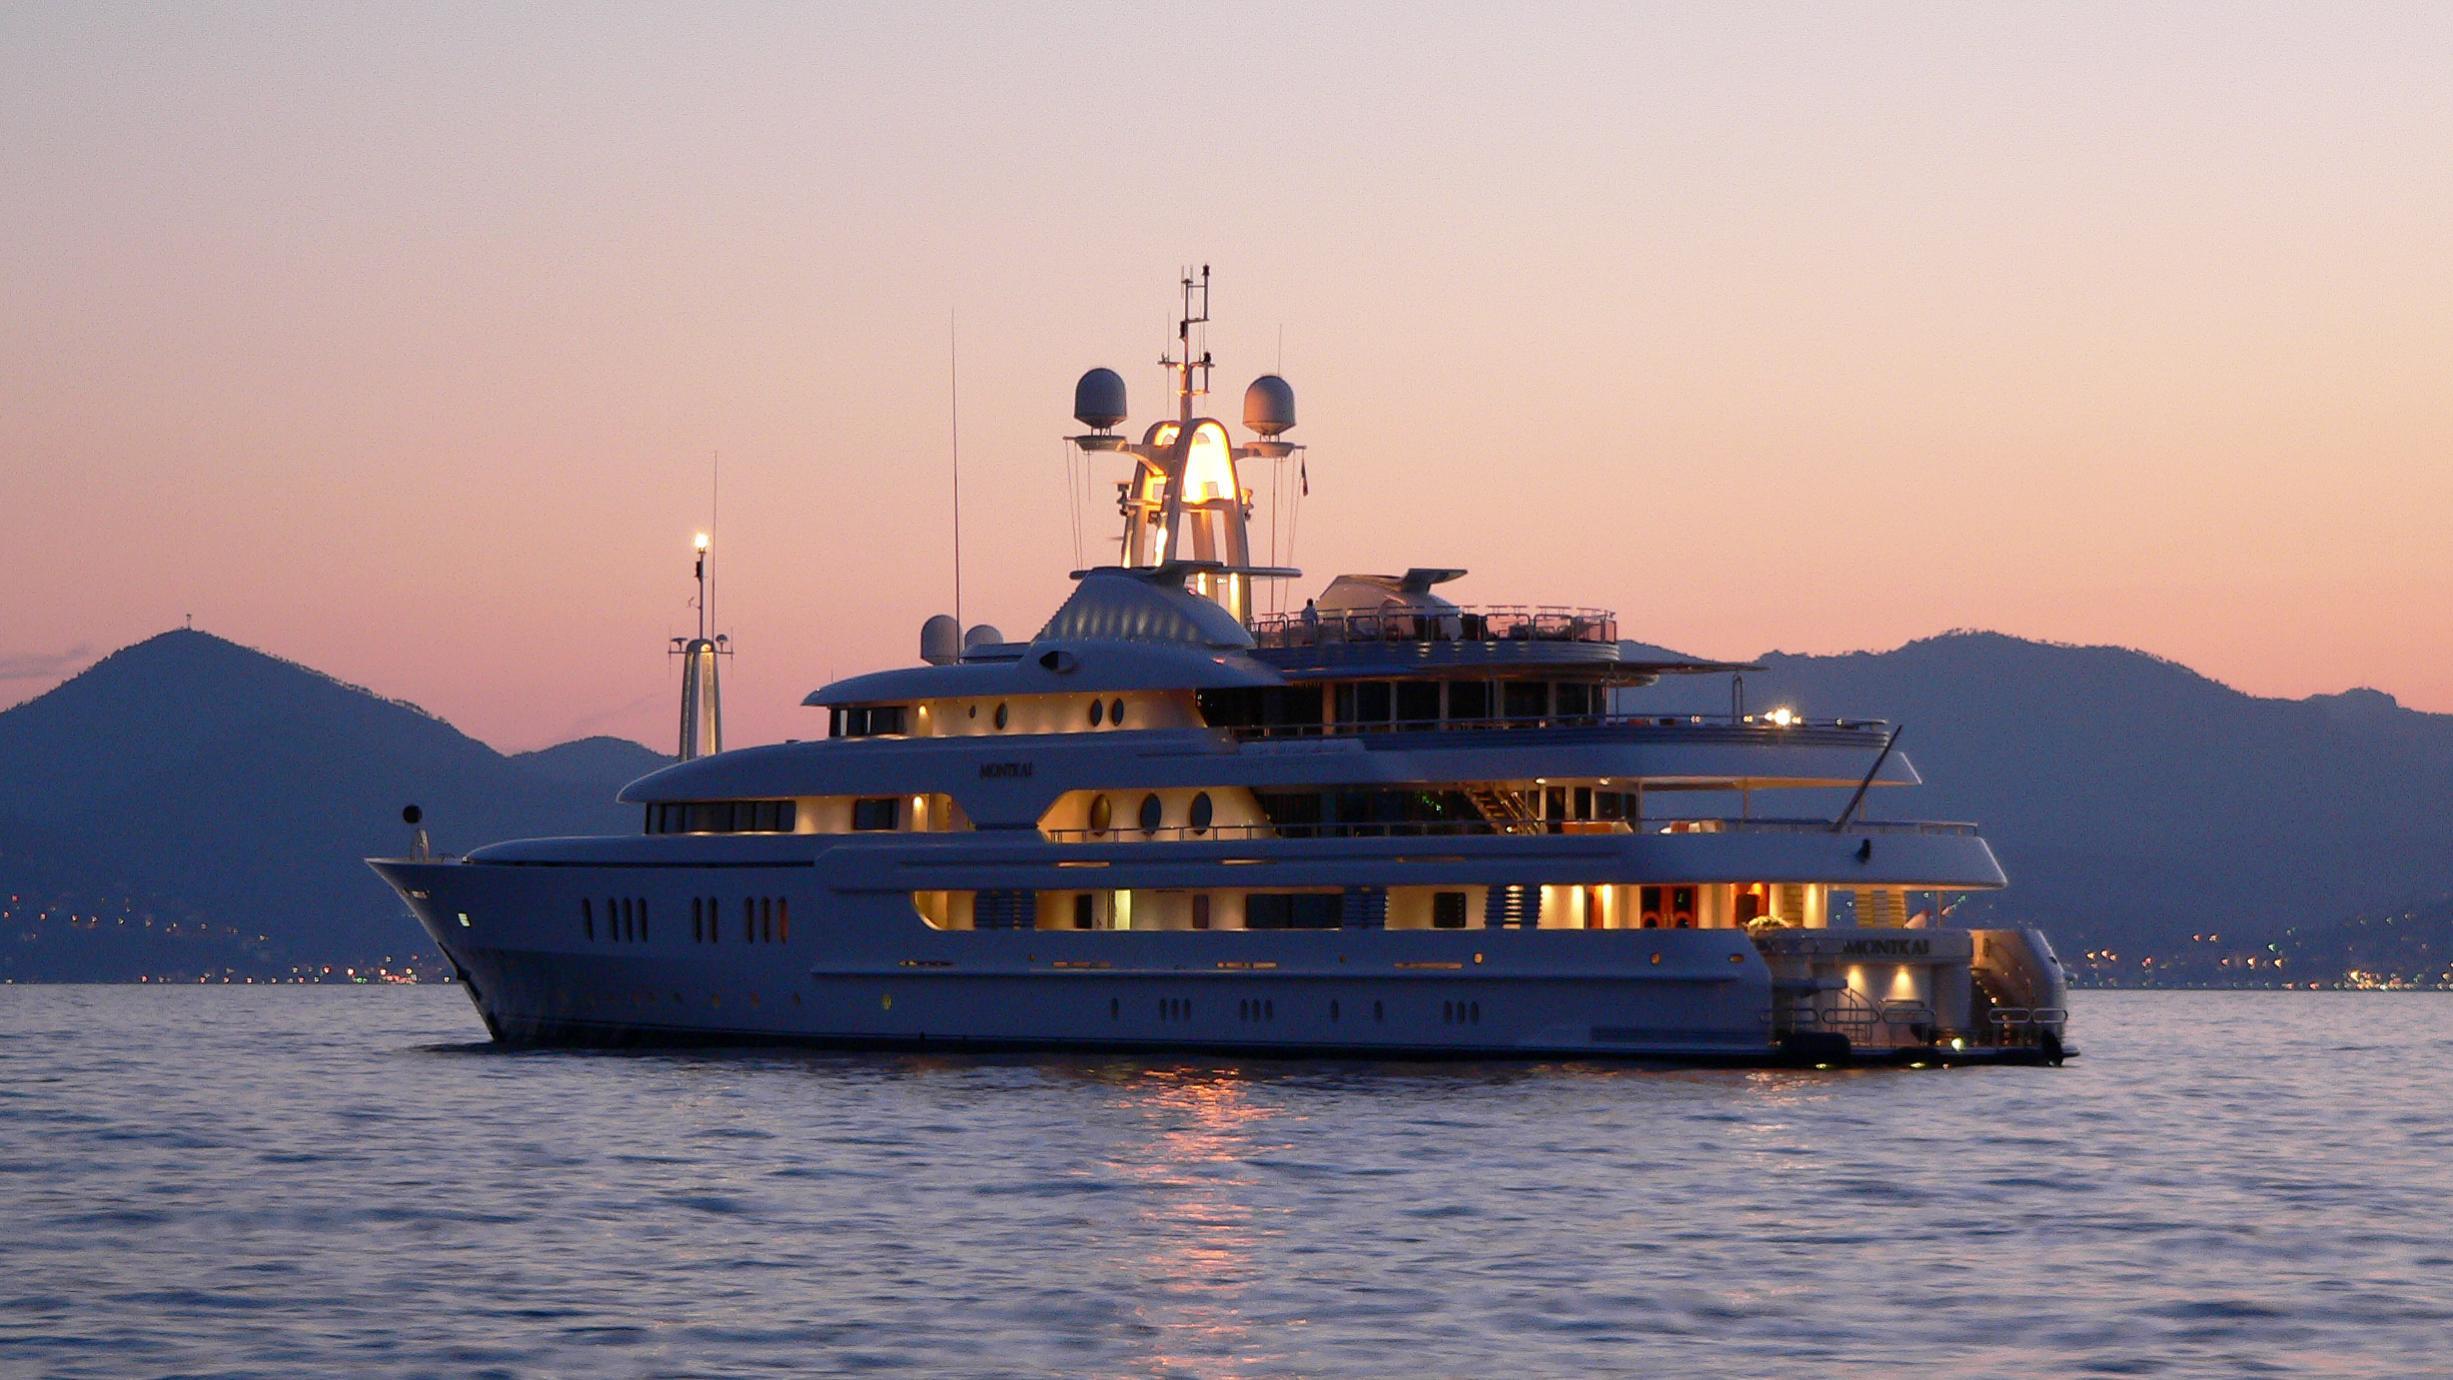 montkaj-motor-yacht-amels-1995-78m-stern-by-night